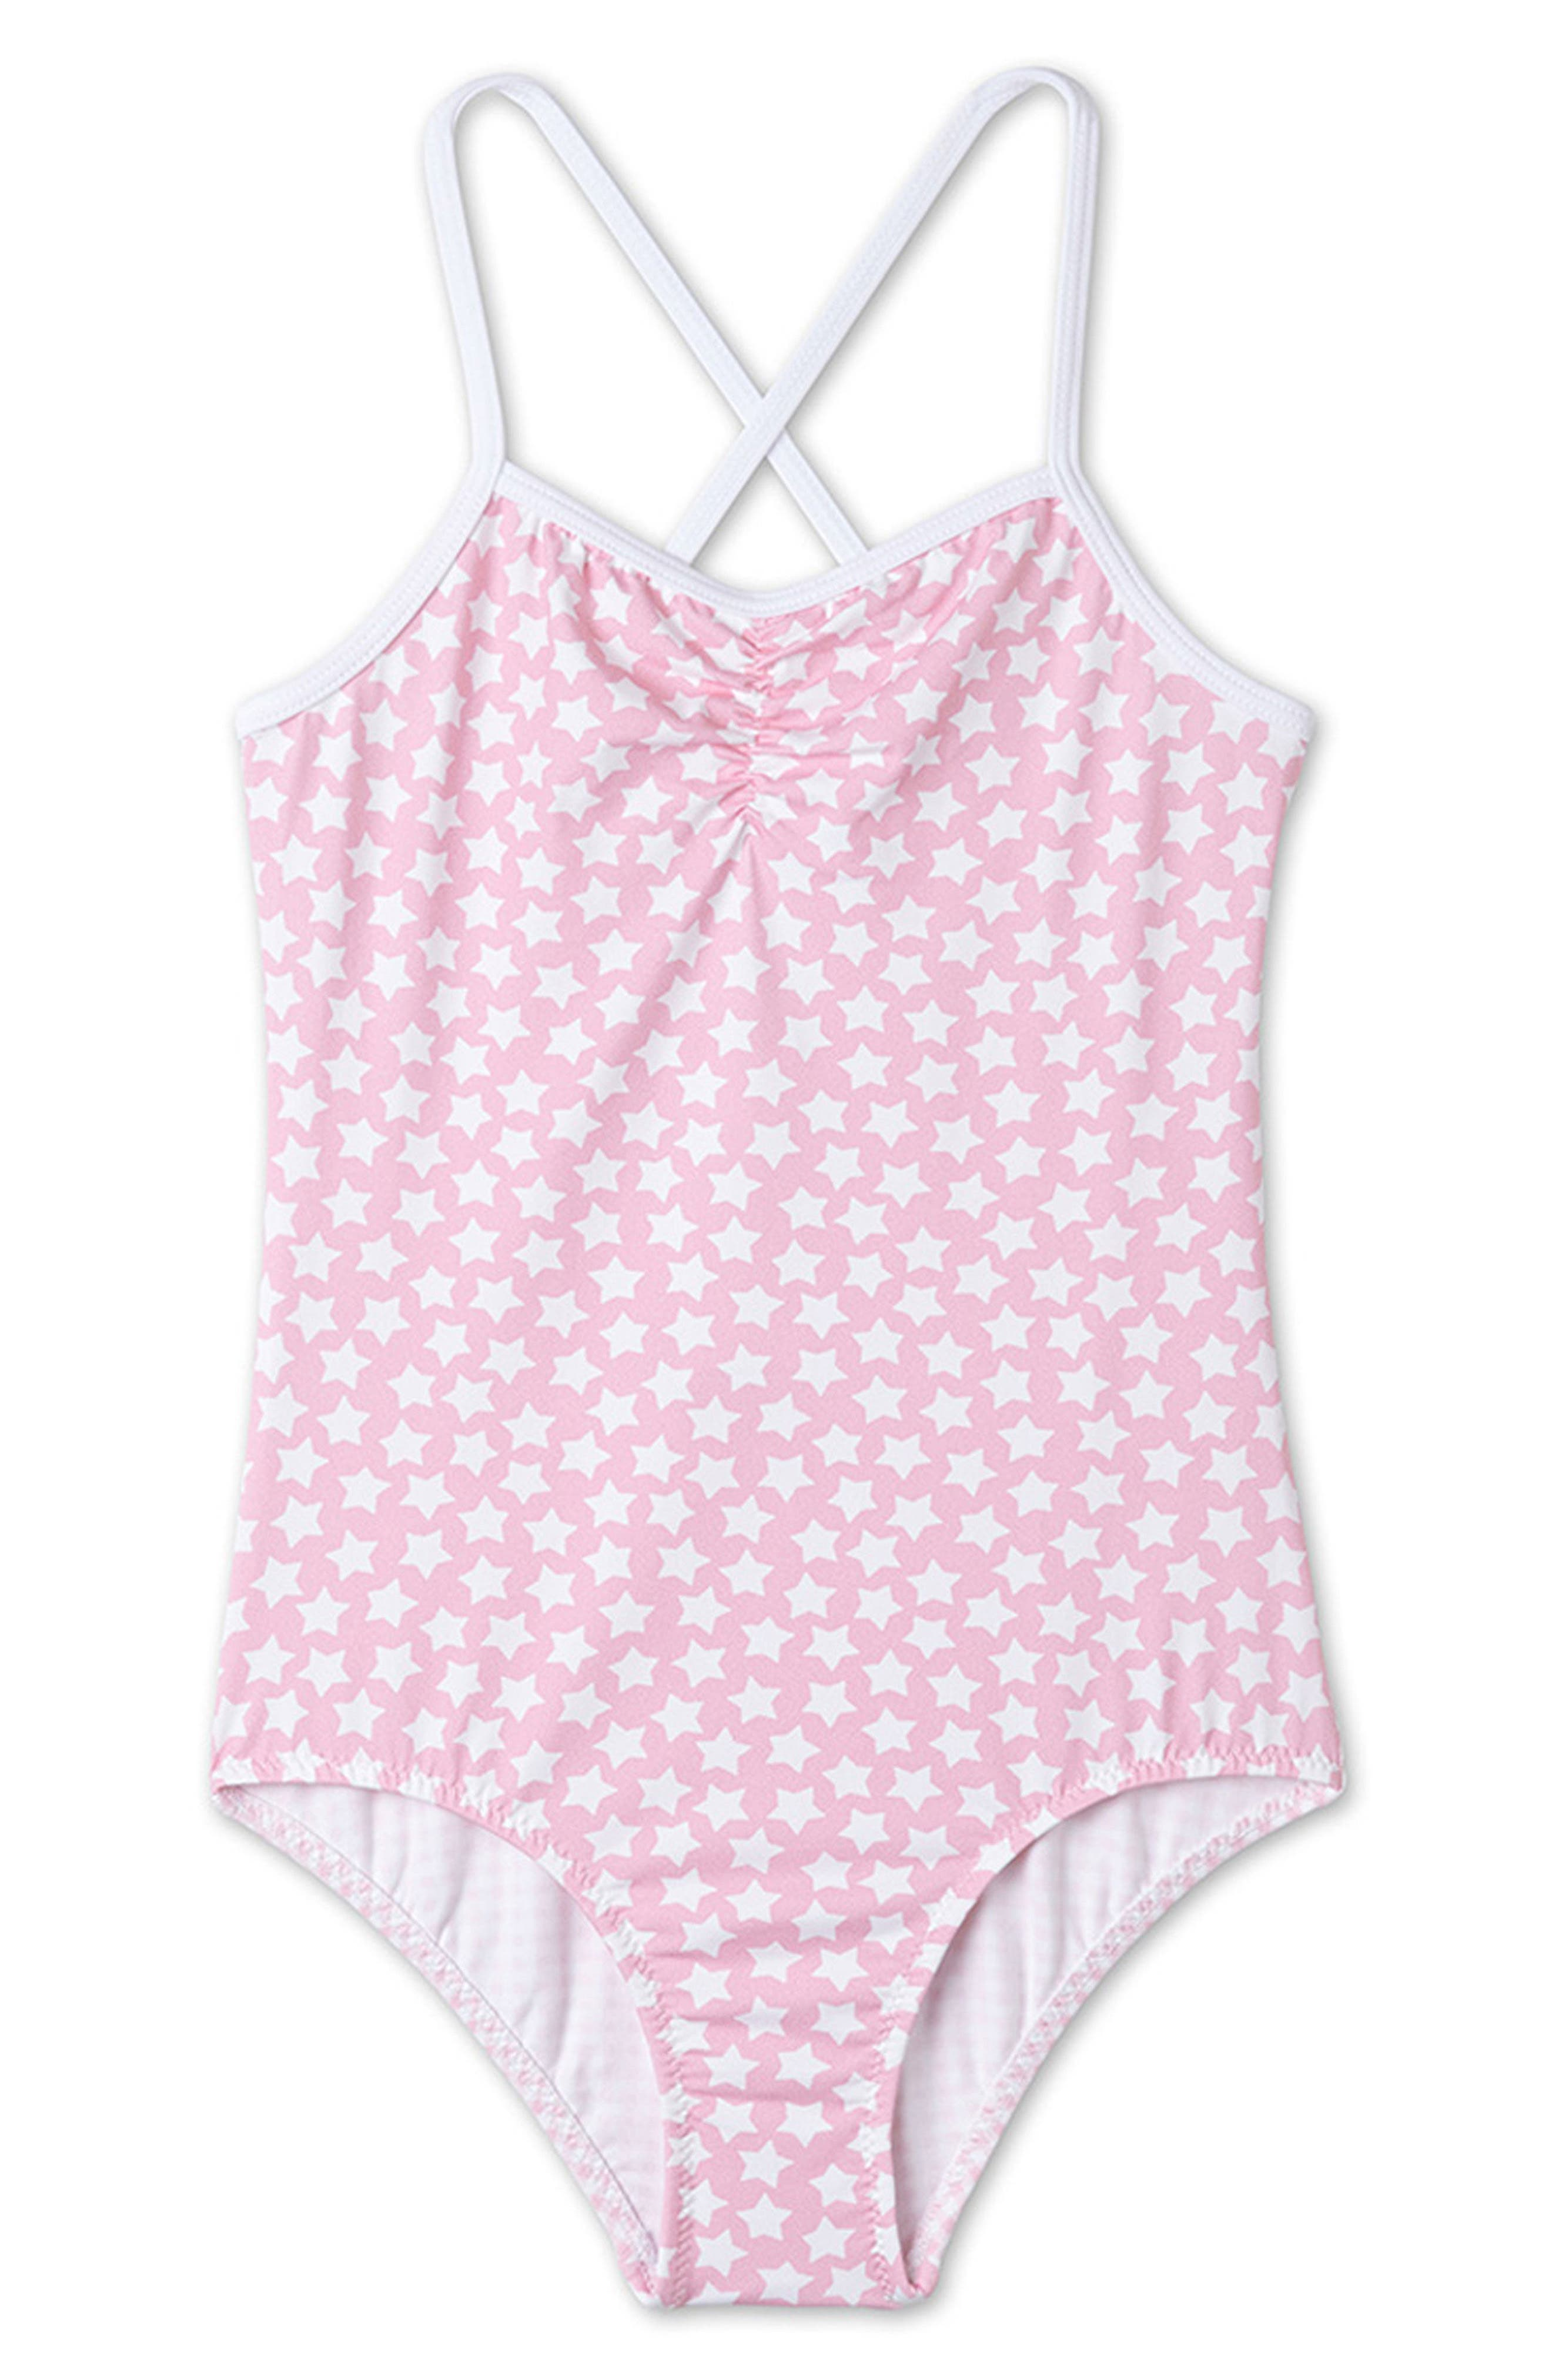 Stella Cove Pink Star Print One-Piece Swimsuit (Toddler Girls & Little Girls)